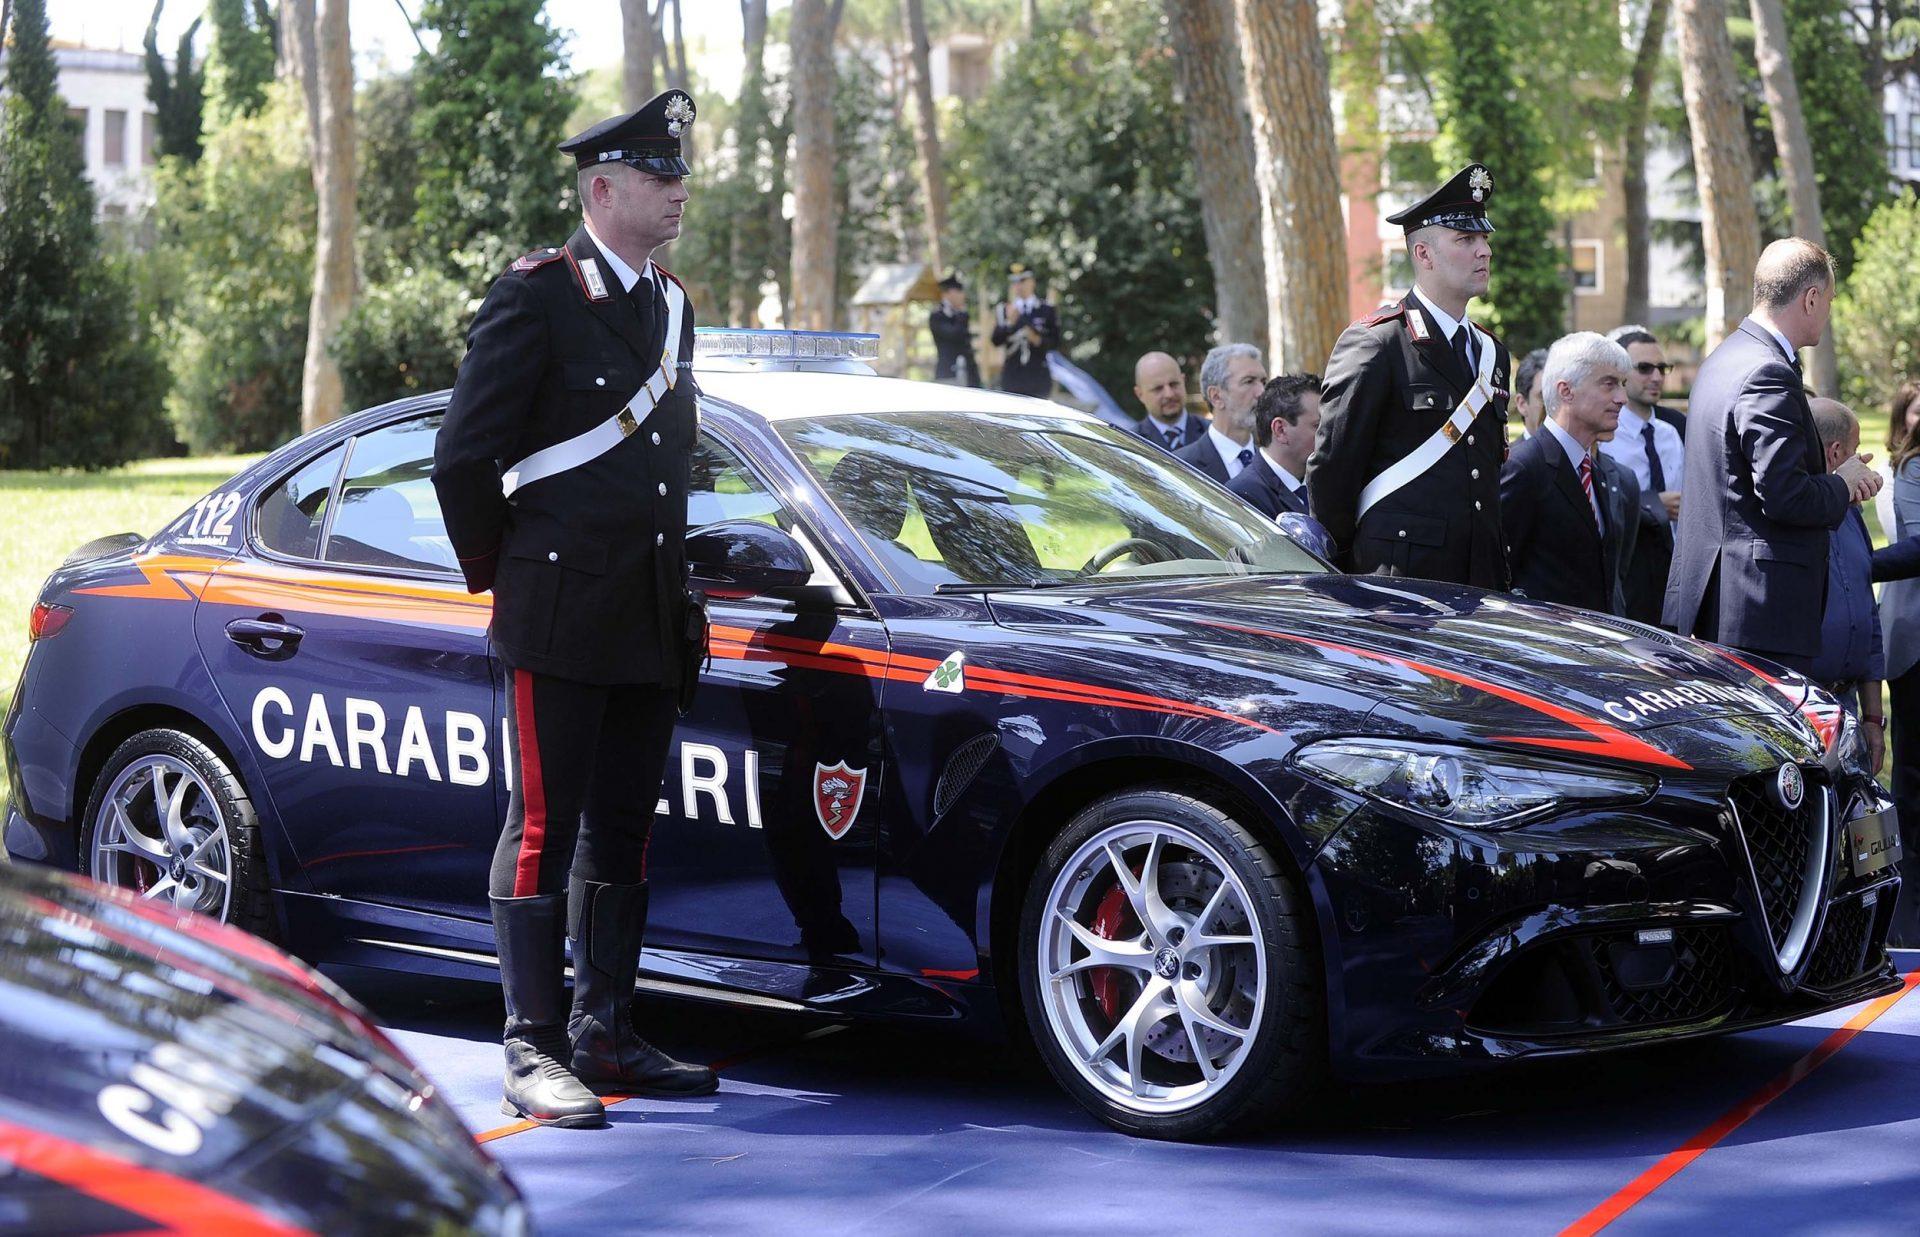 Giulia Carabinieri